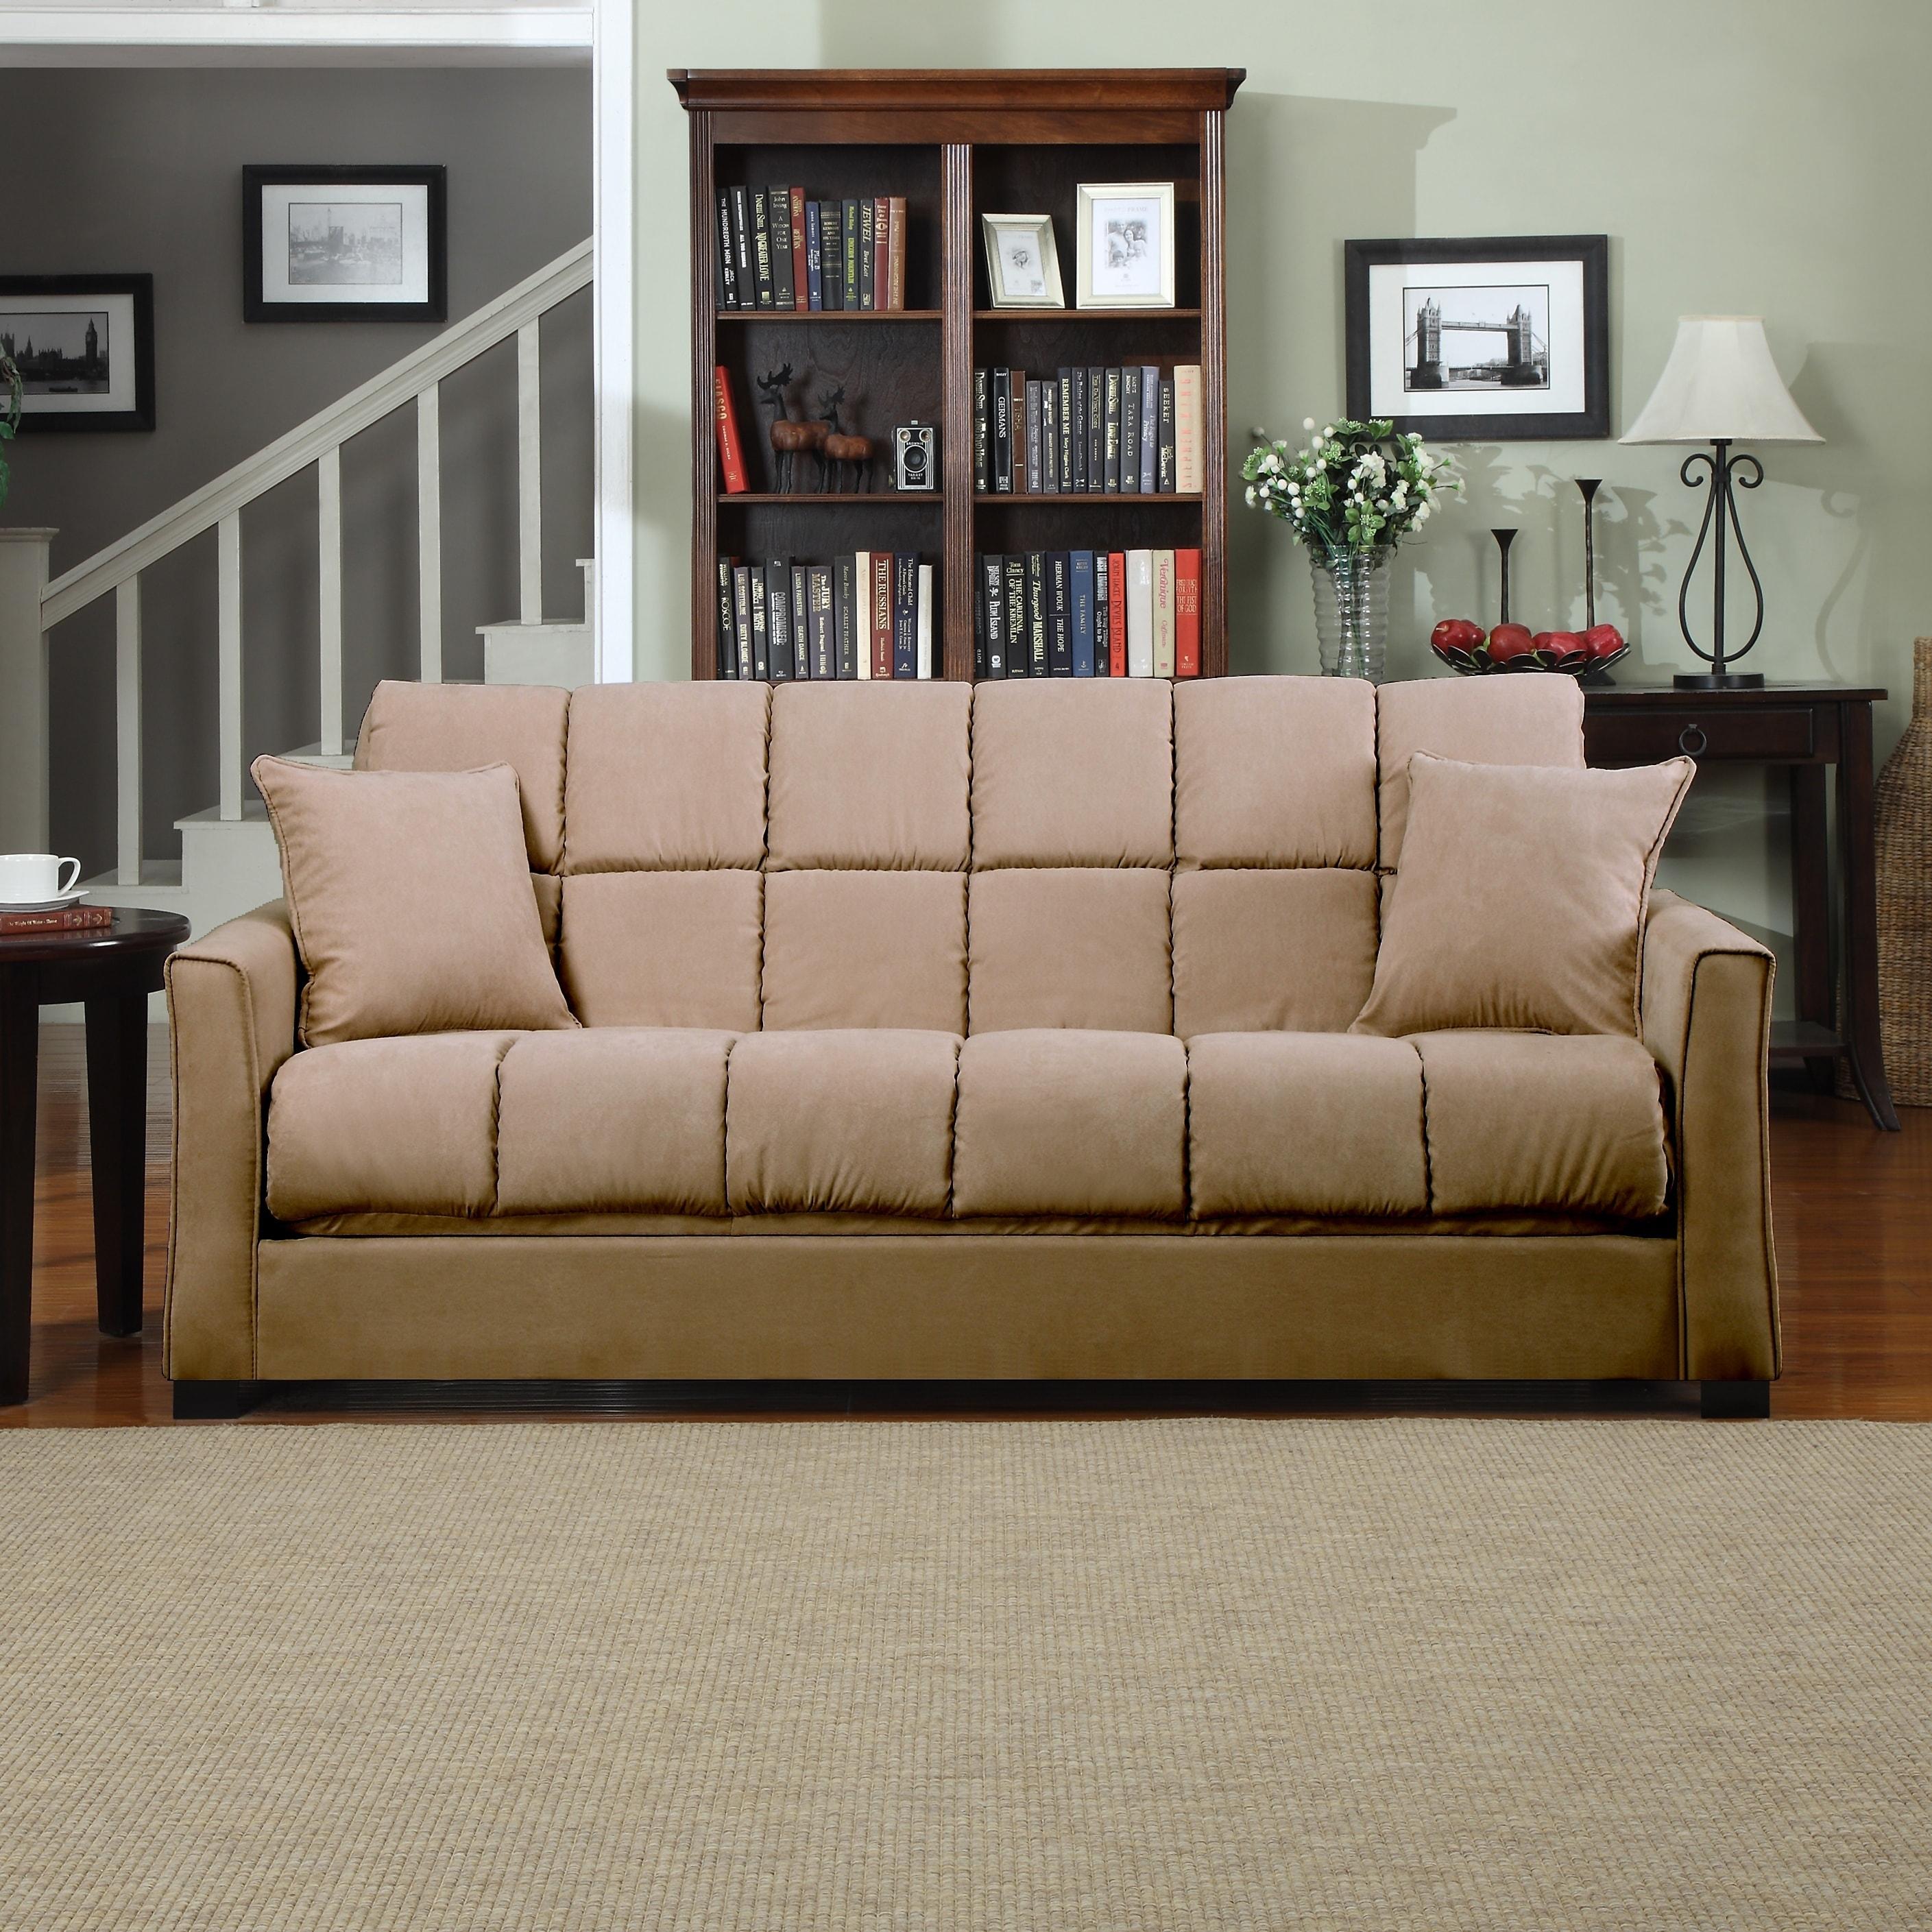 Http Www Valuecityfurniture Com Search V Living Room Seating Sofas